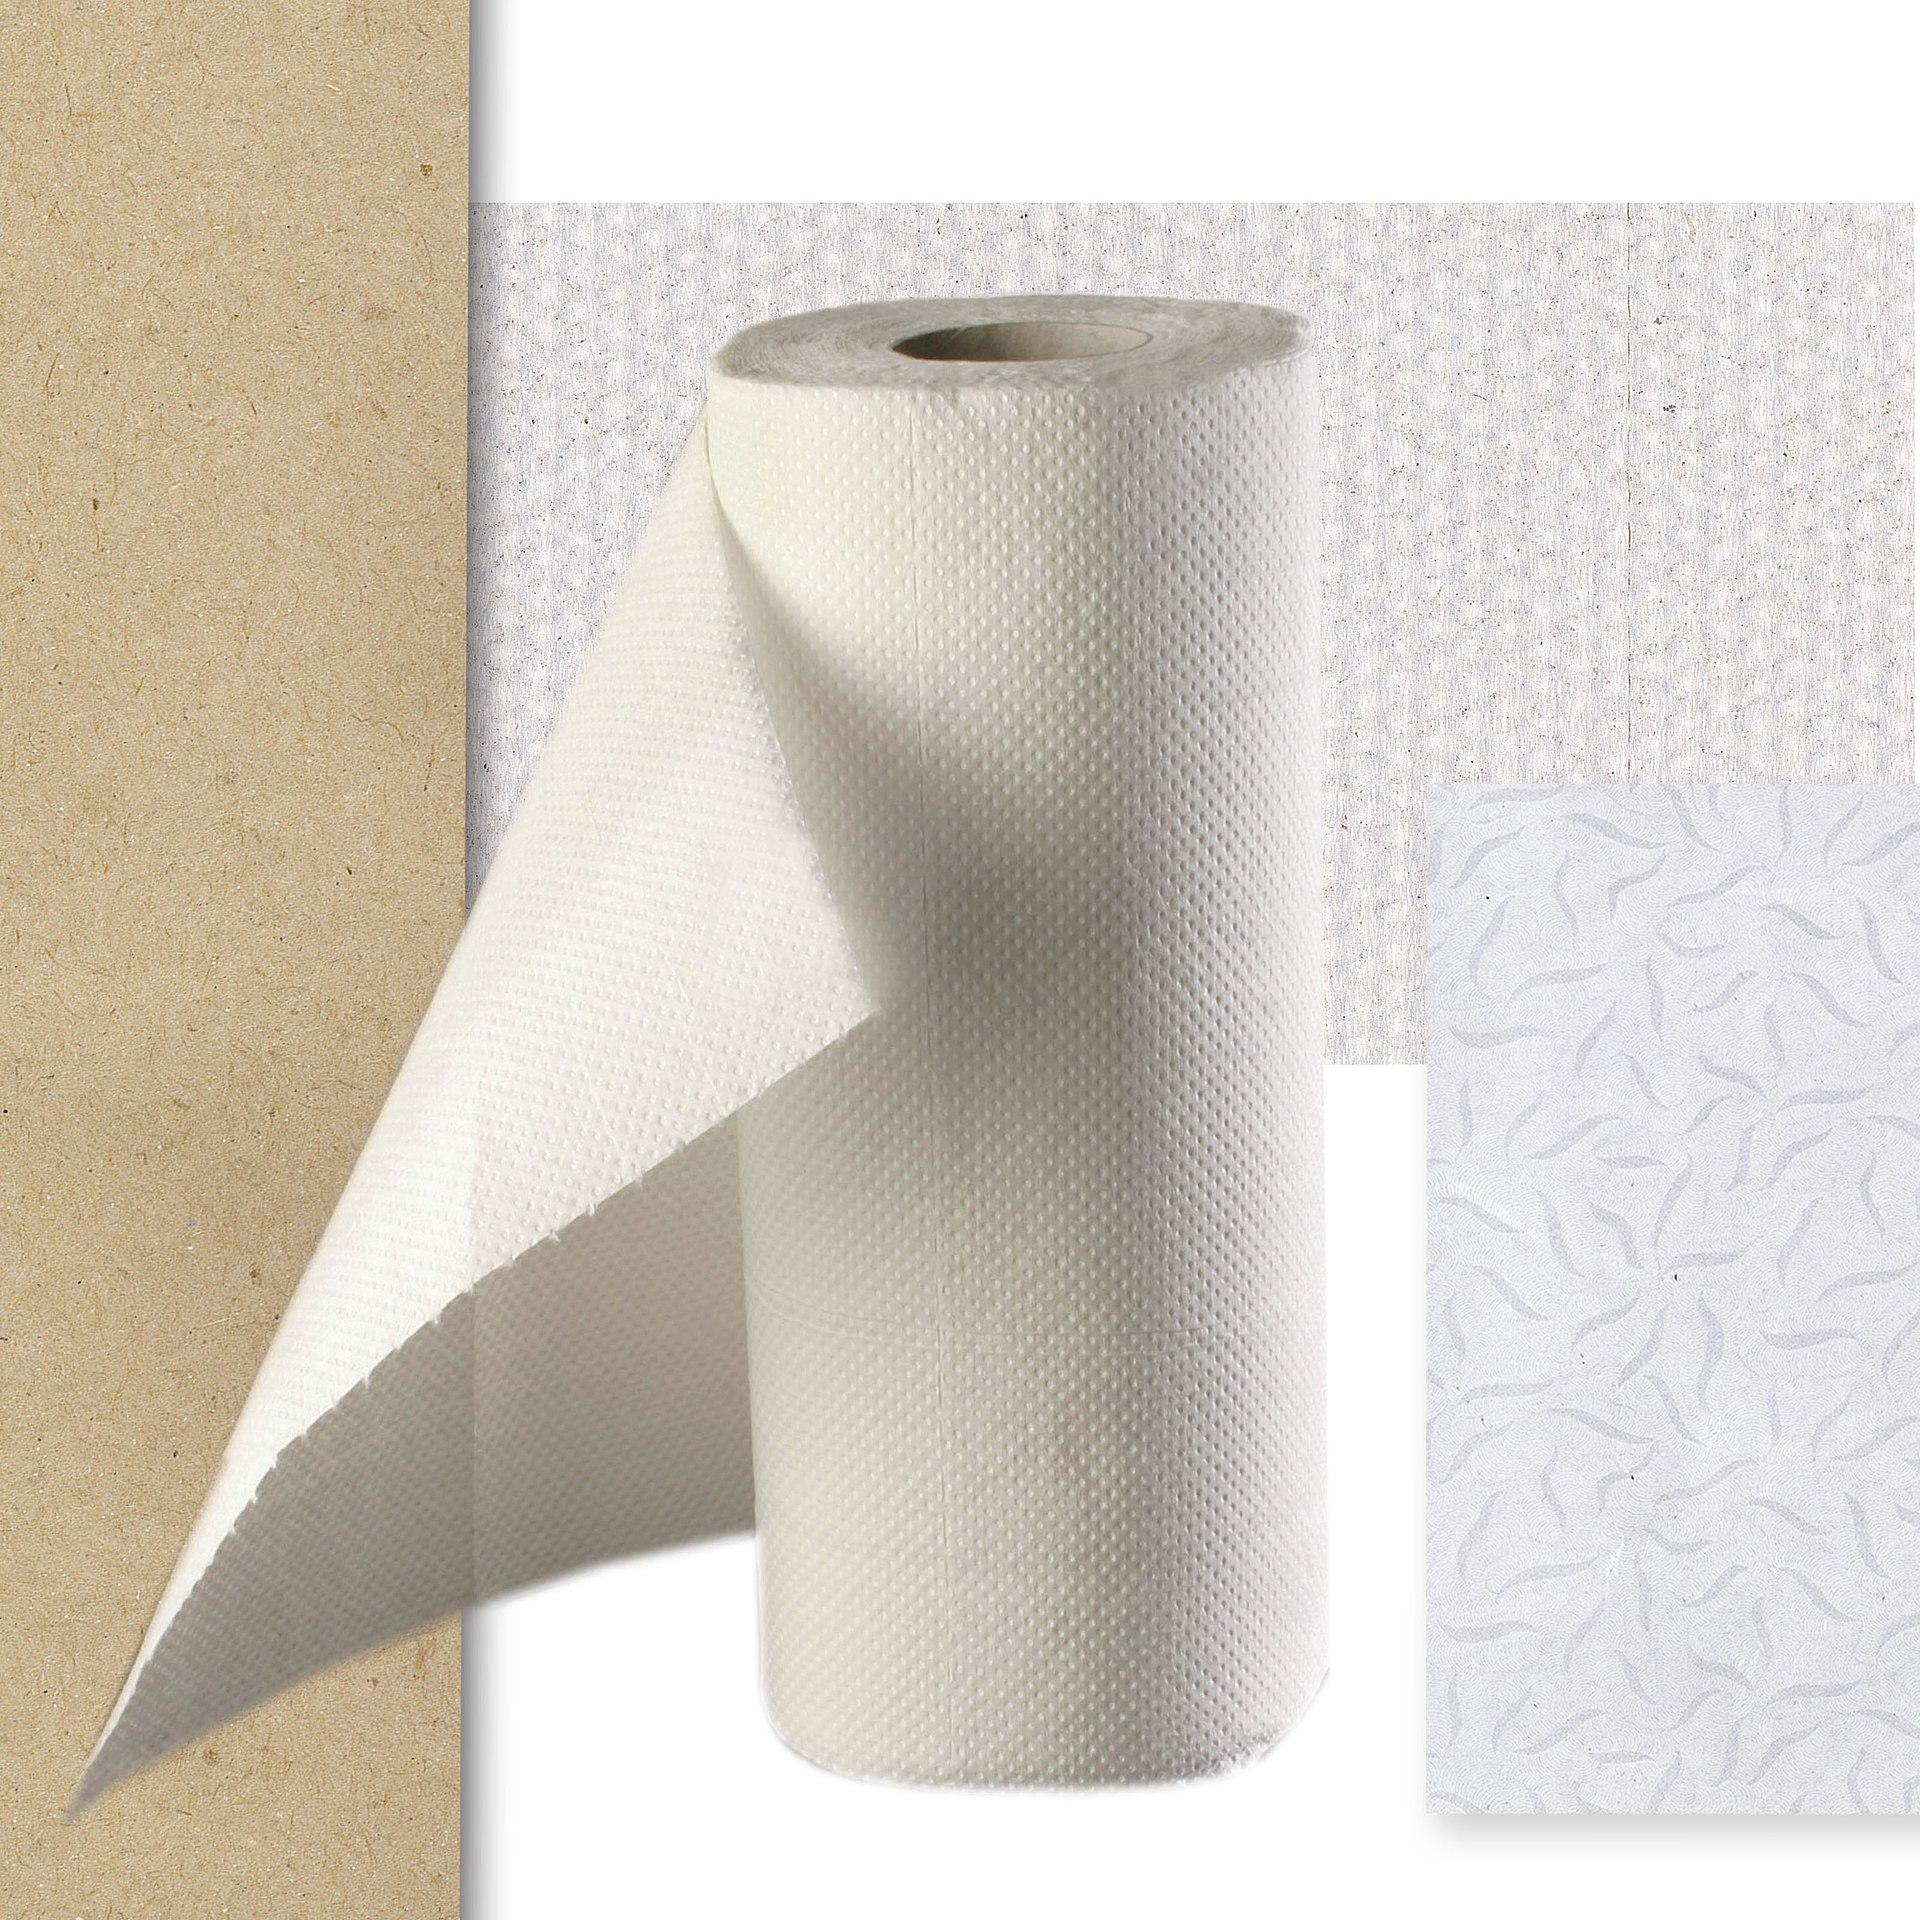 Decorative Paper Towel Holder Kitchen